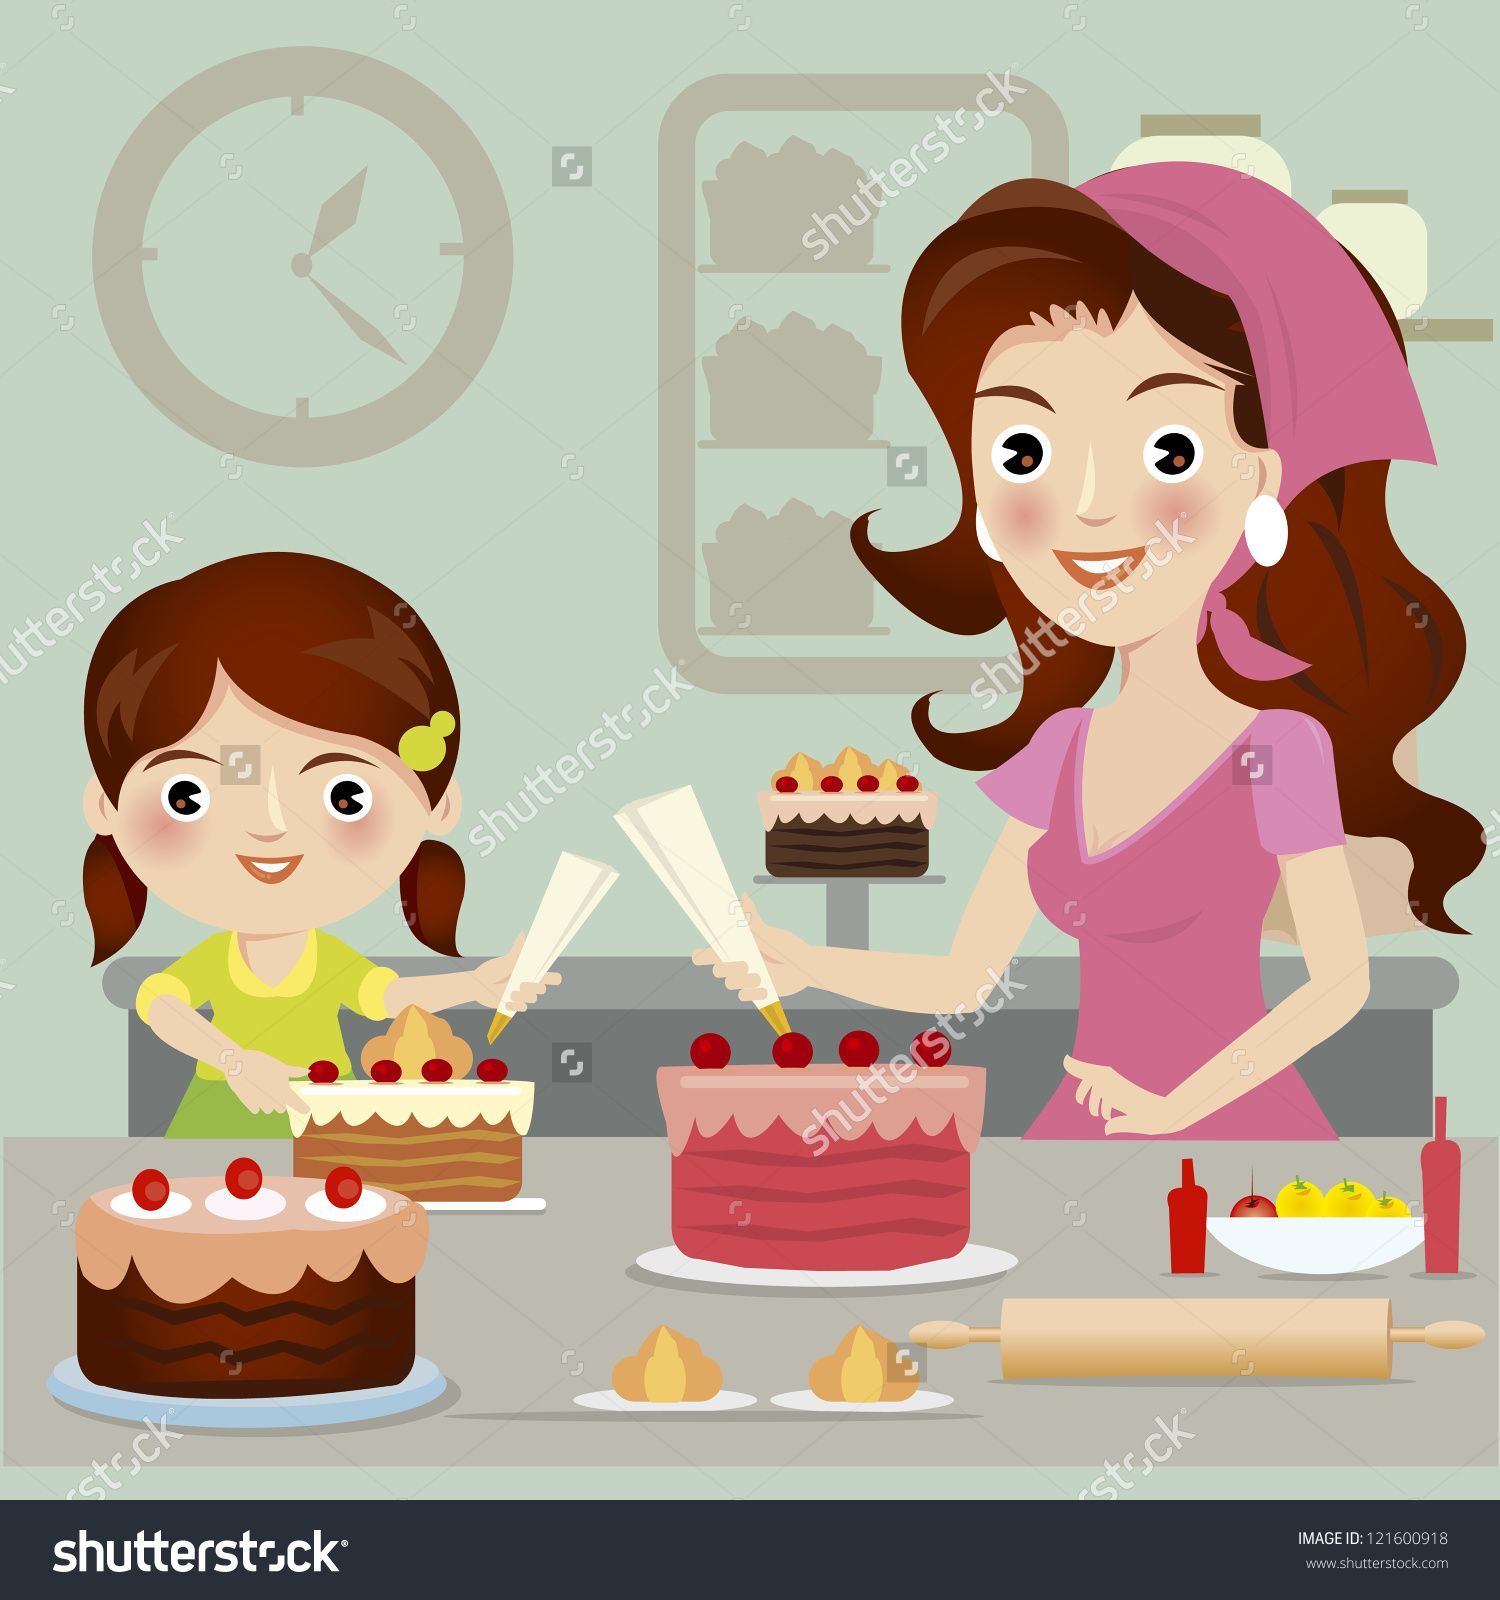 clipart lady bakery.